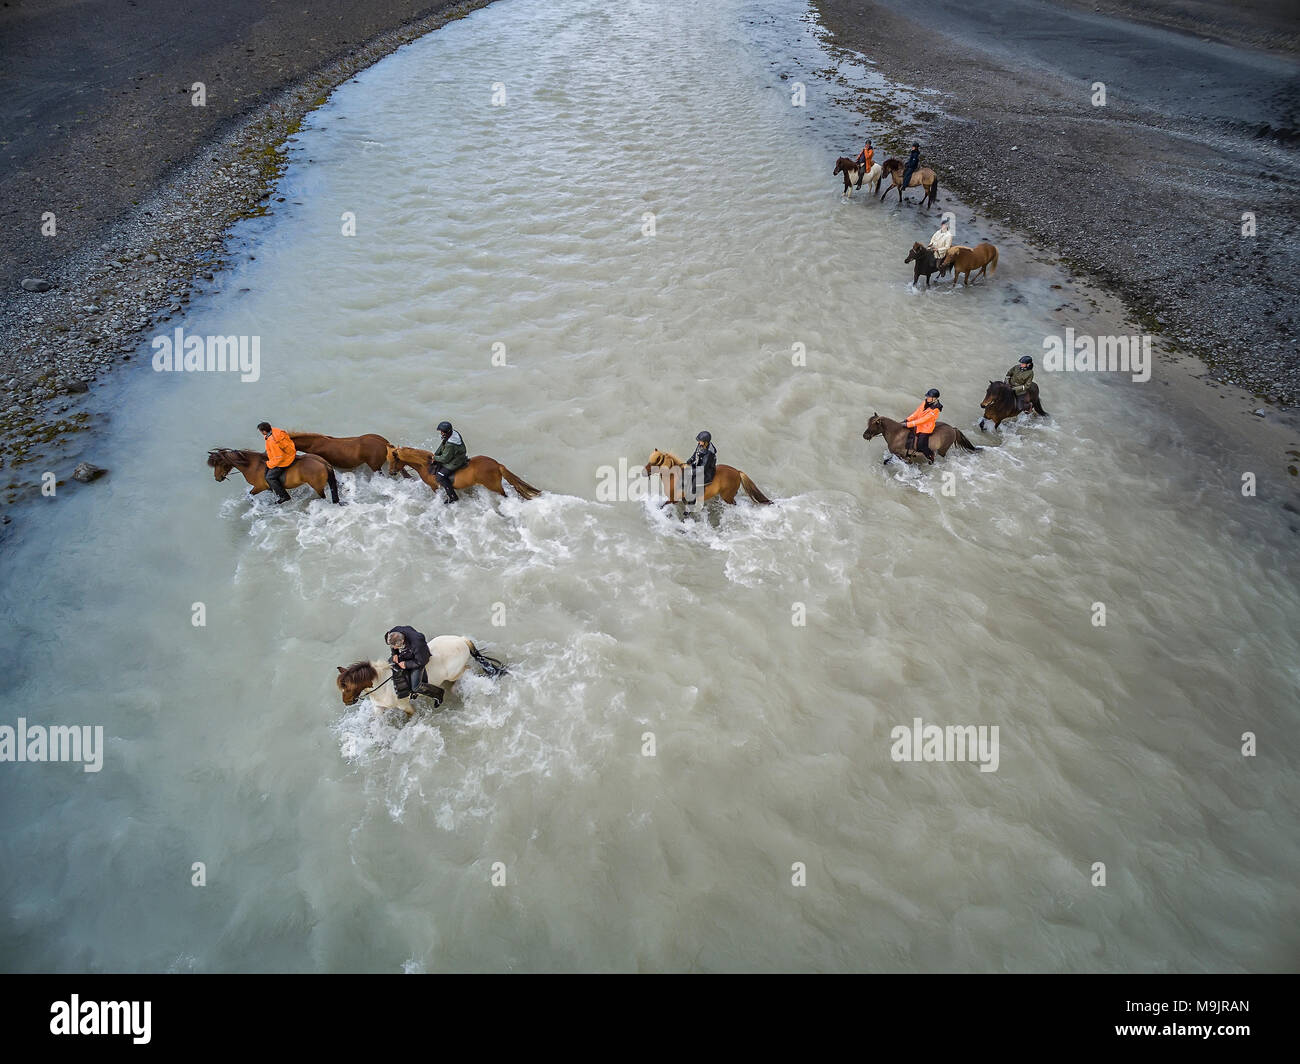 Traversée de la rivière glaciaire chevaux Farid près de Hagafellsjokull Glacier, Islande Photo Stock